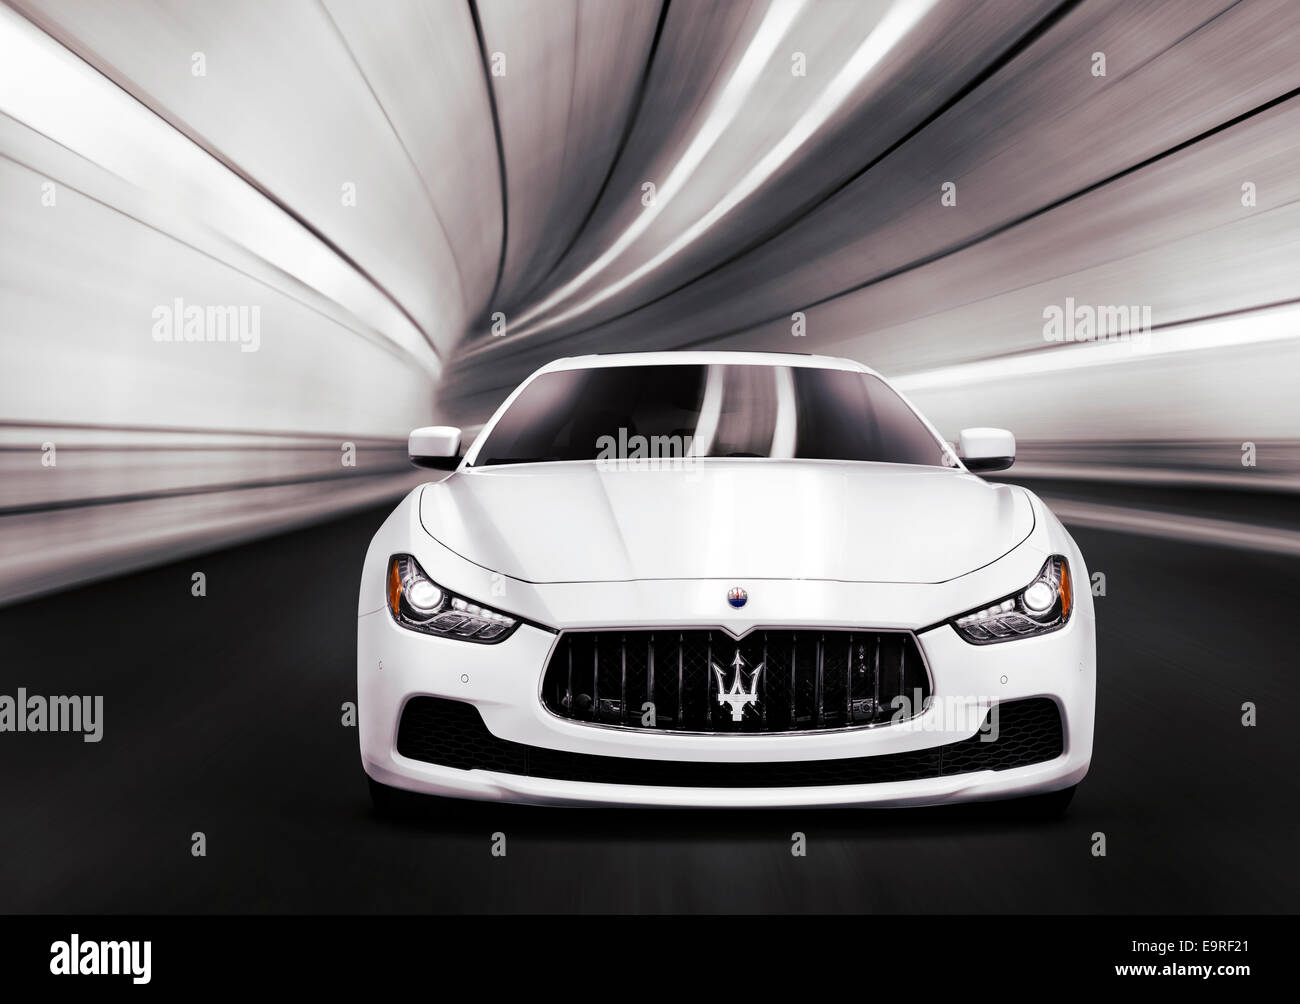 White 2014 Maserati Ghibli S Q4 Luxury Car Speeding In A Tunnel